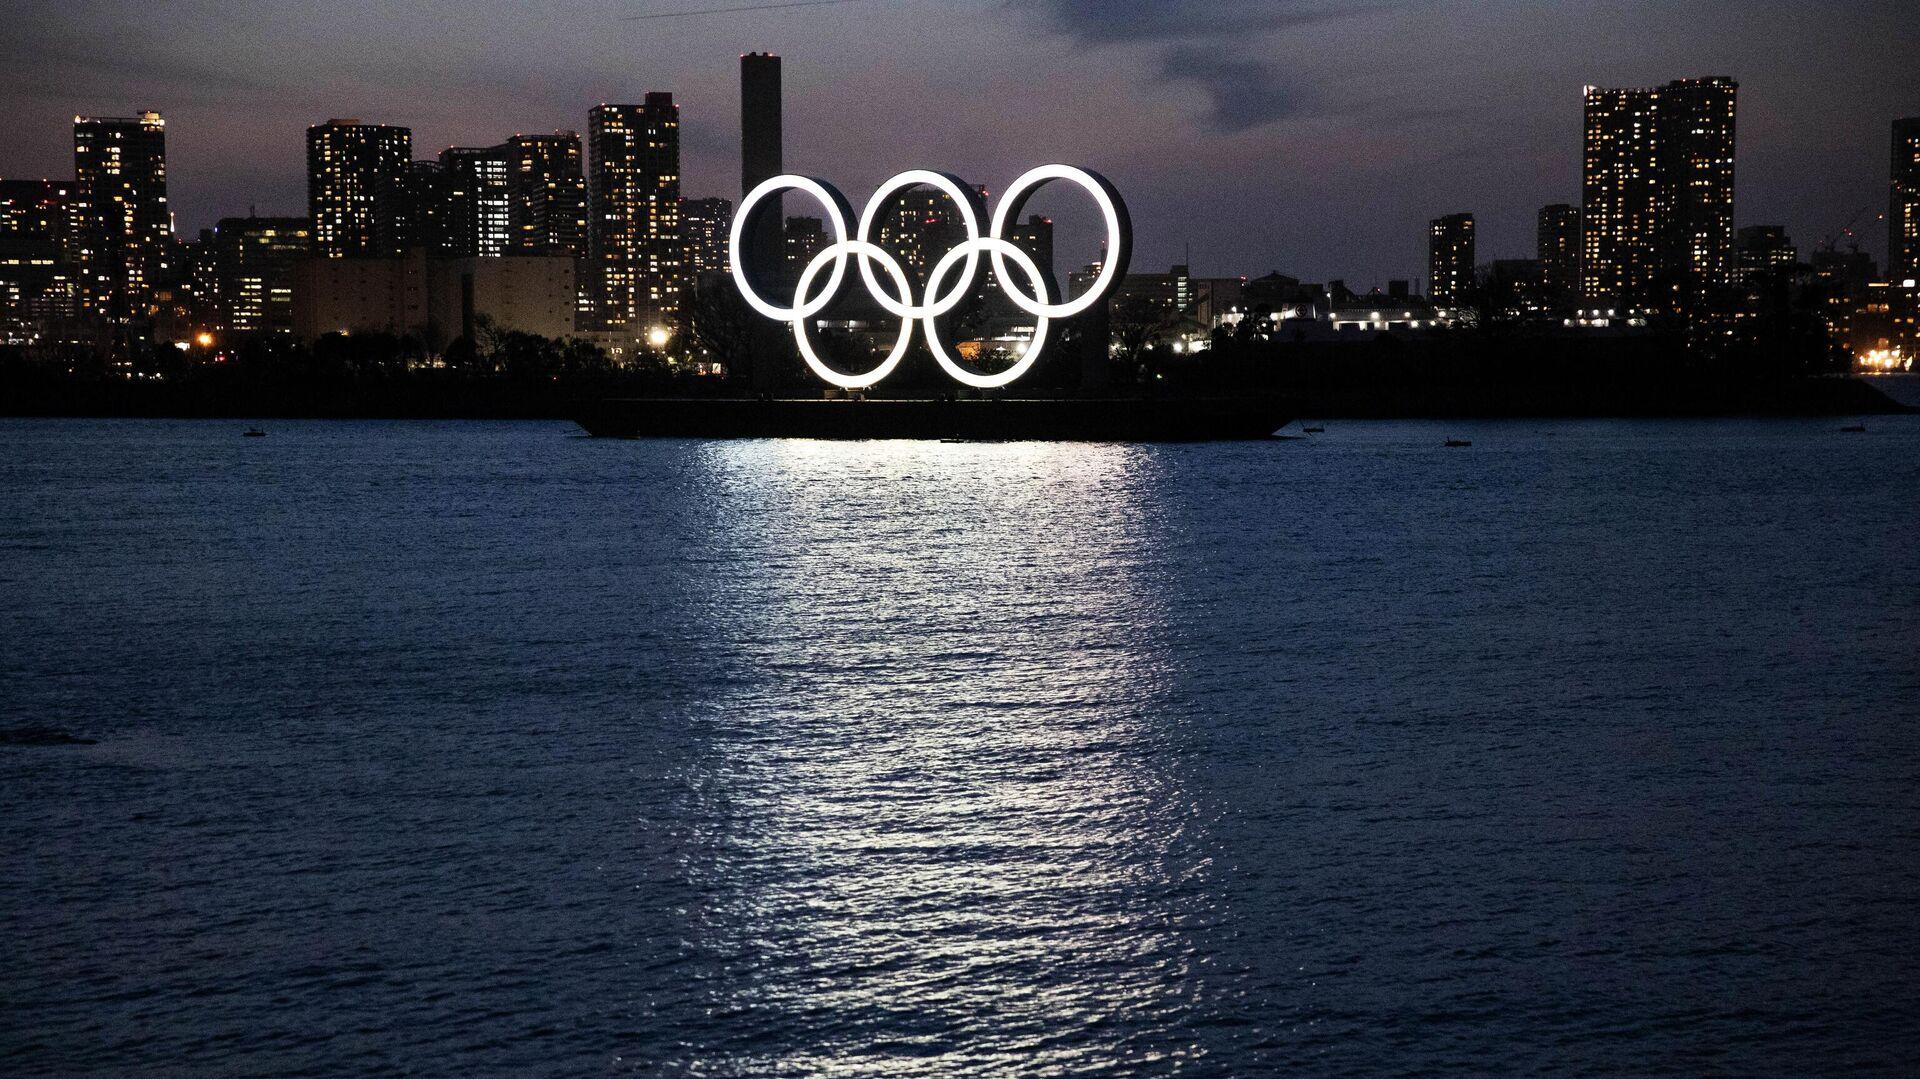 Олимпийские кольца в Токио - РИА Новости, 1920, 13.06.2021